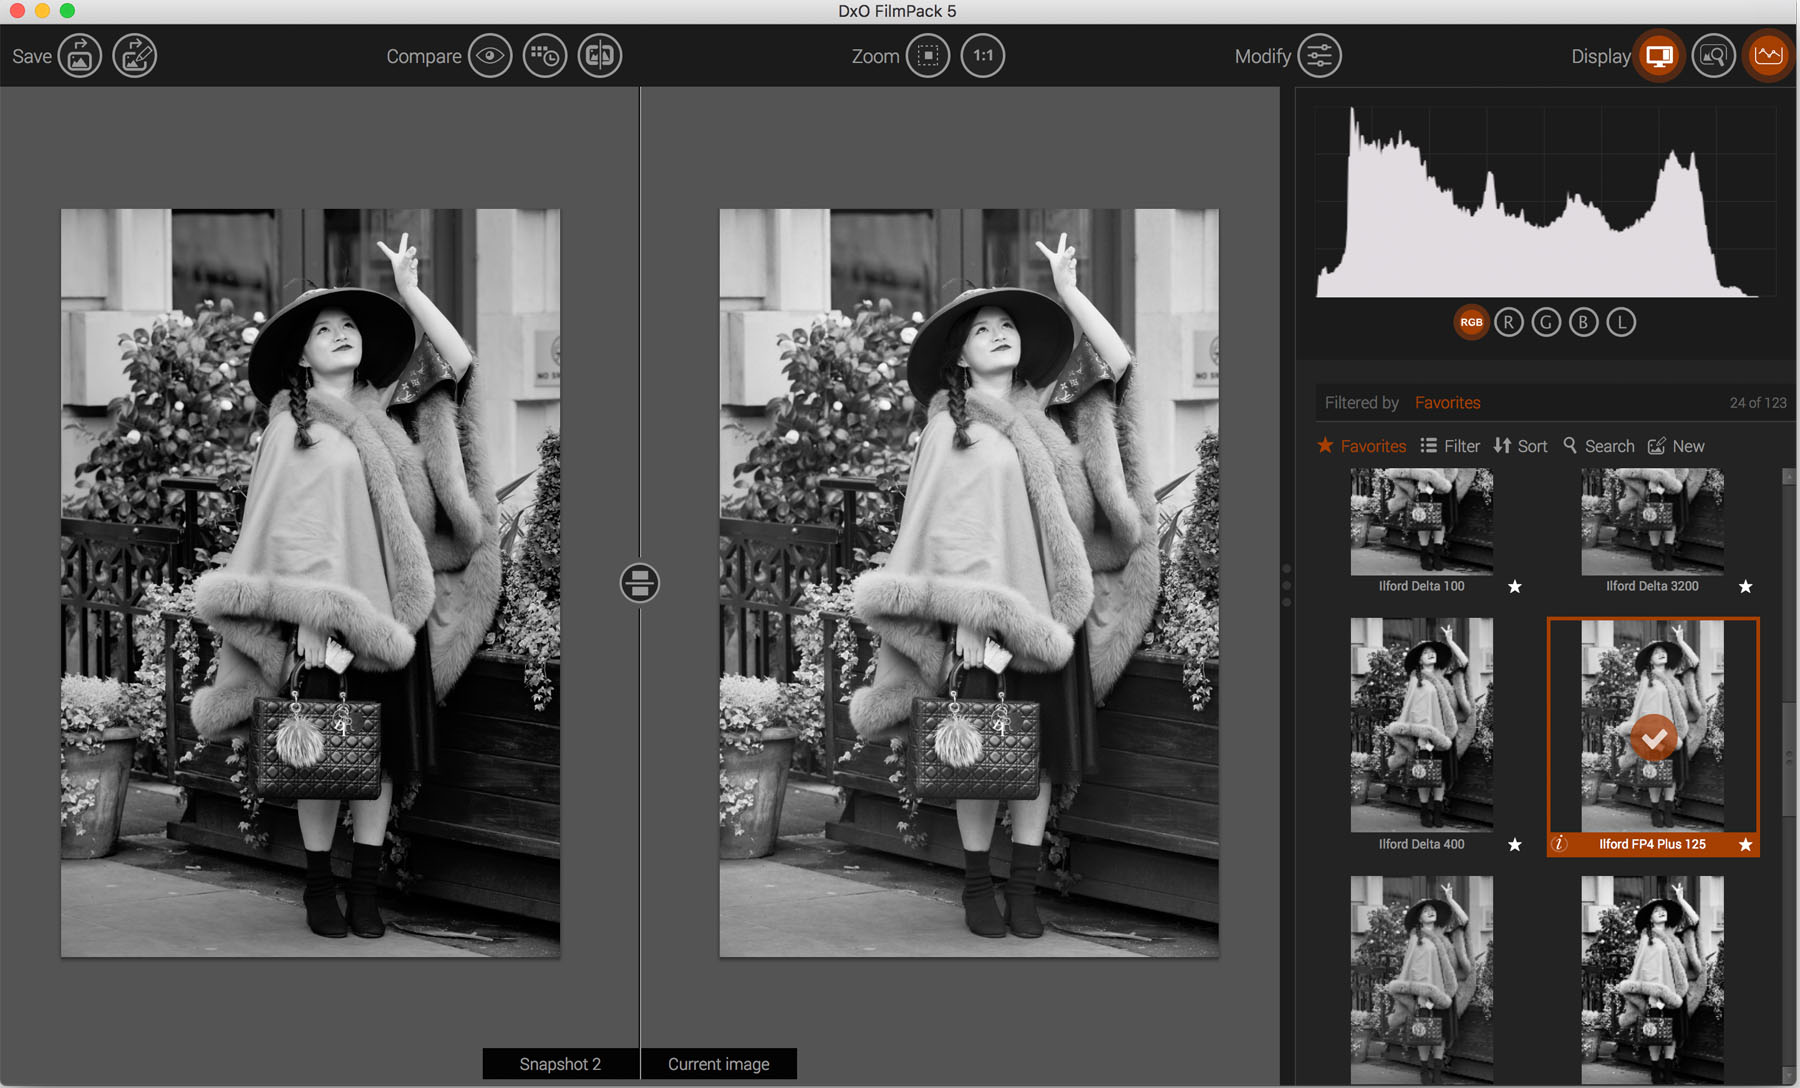 Monochrome Conversion Using DxO FilmPack 5  Left: Agfa Scala 200x  Right: Ilford FP4 Plus 125 Profile